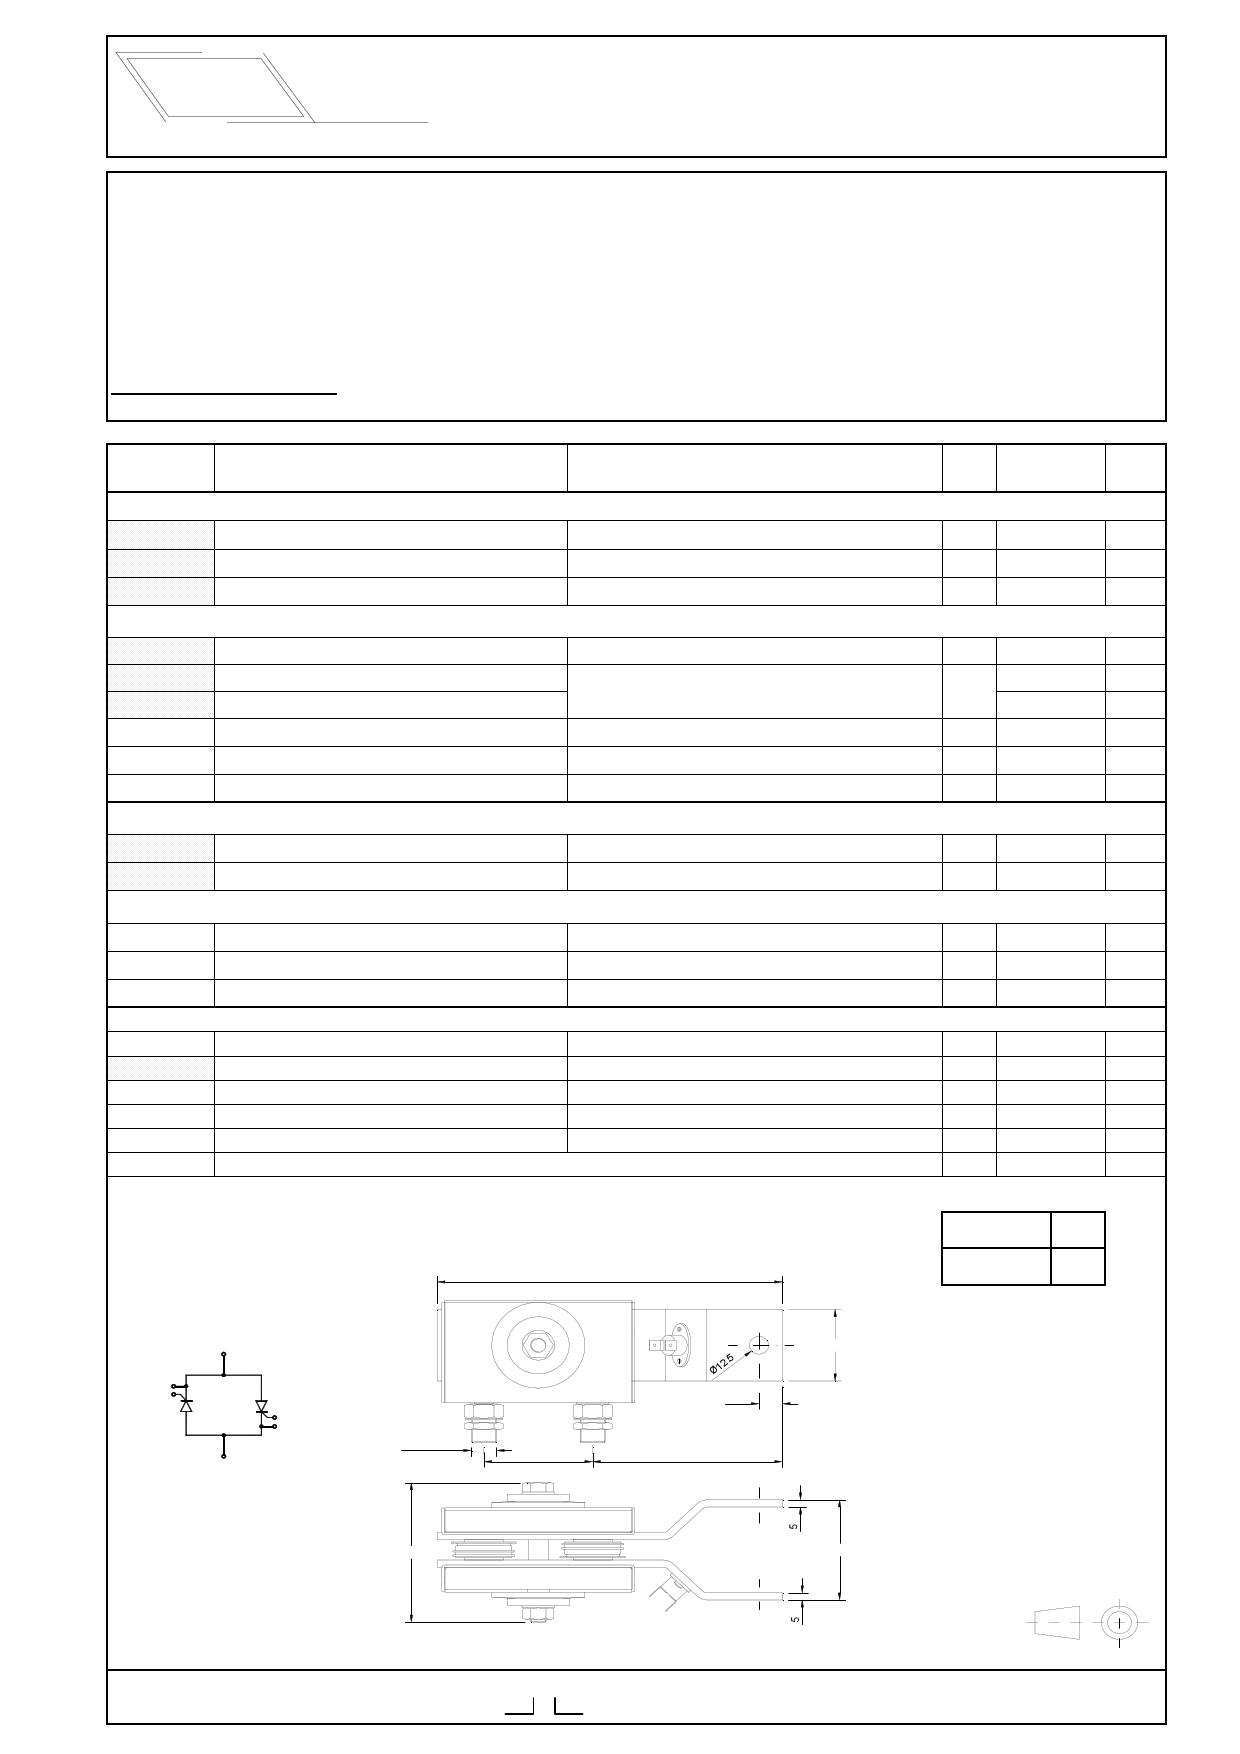 2-2WI-1000 datasheet